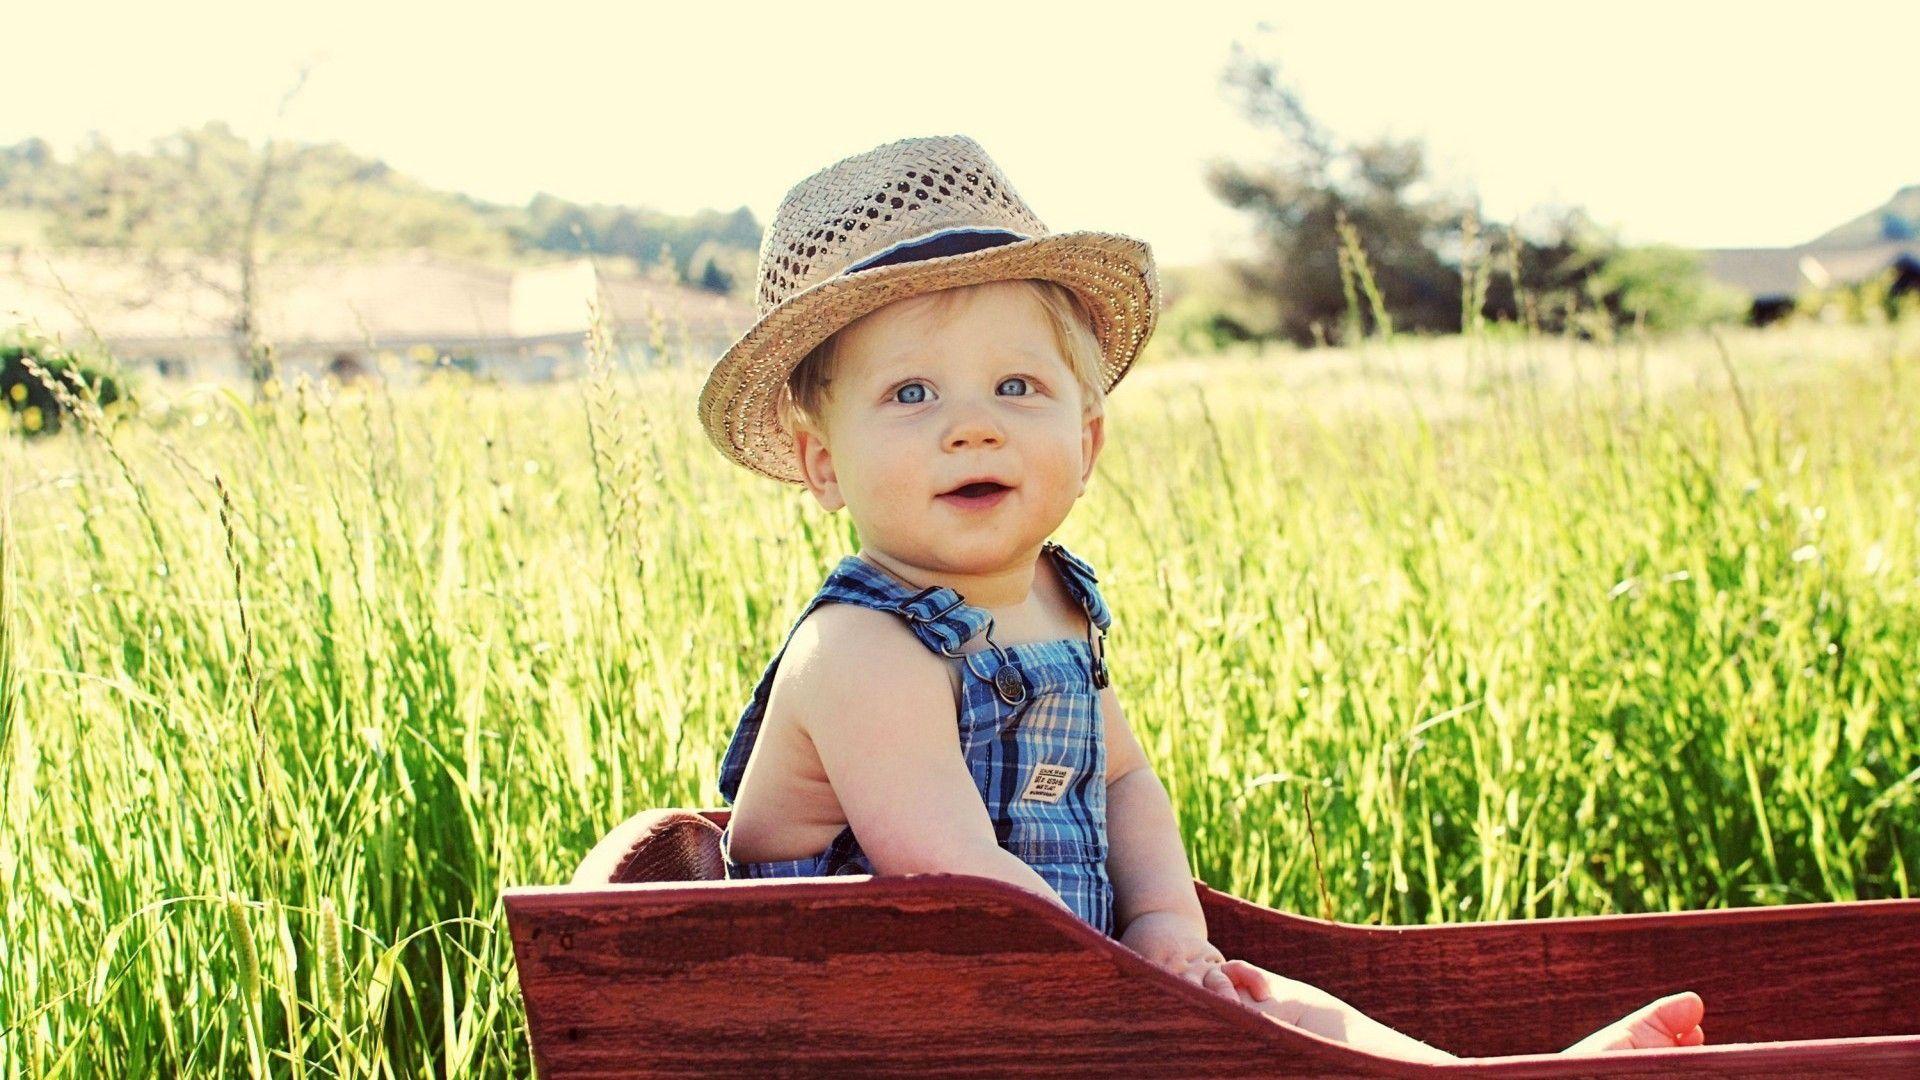 Cute Baby Boys Wallpapers HD e HD Wallpaper